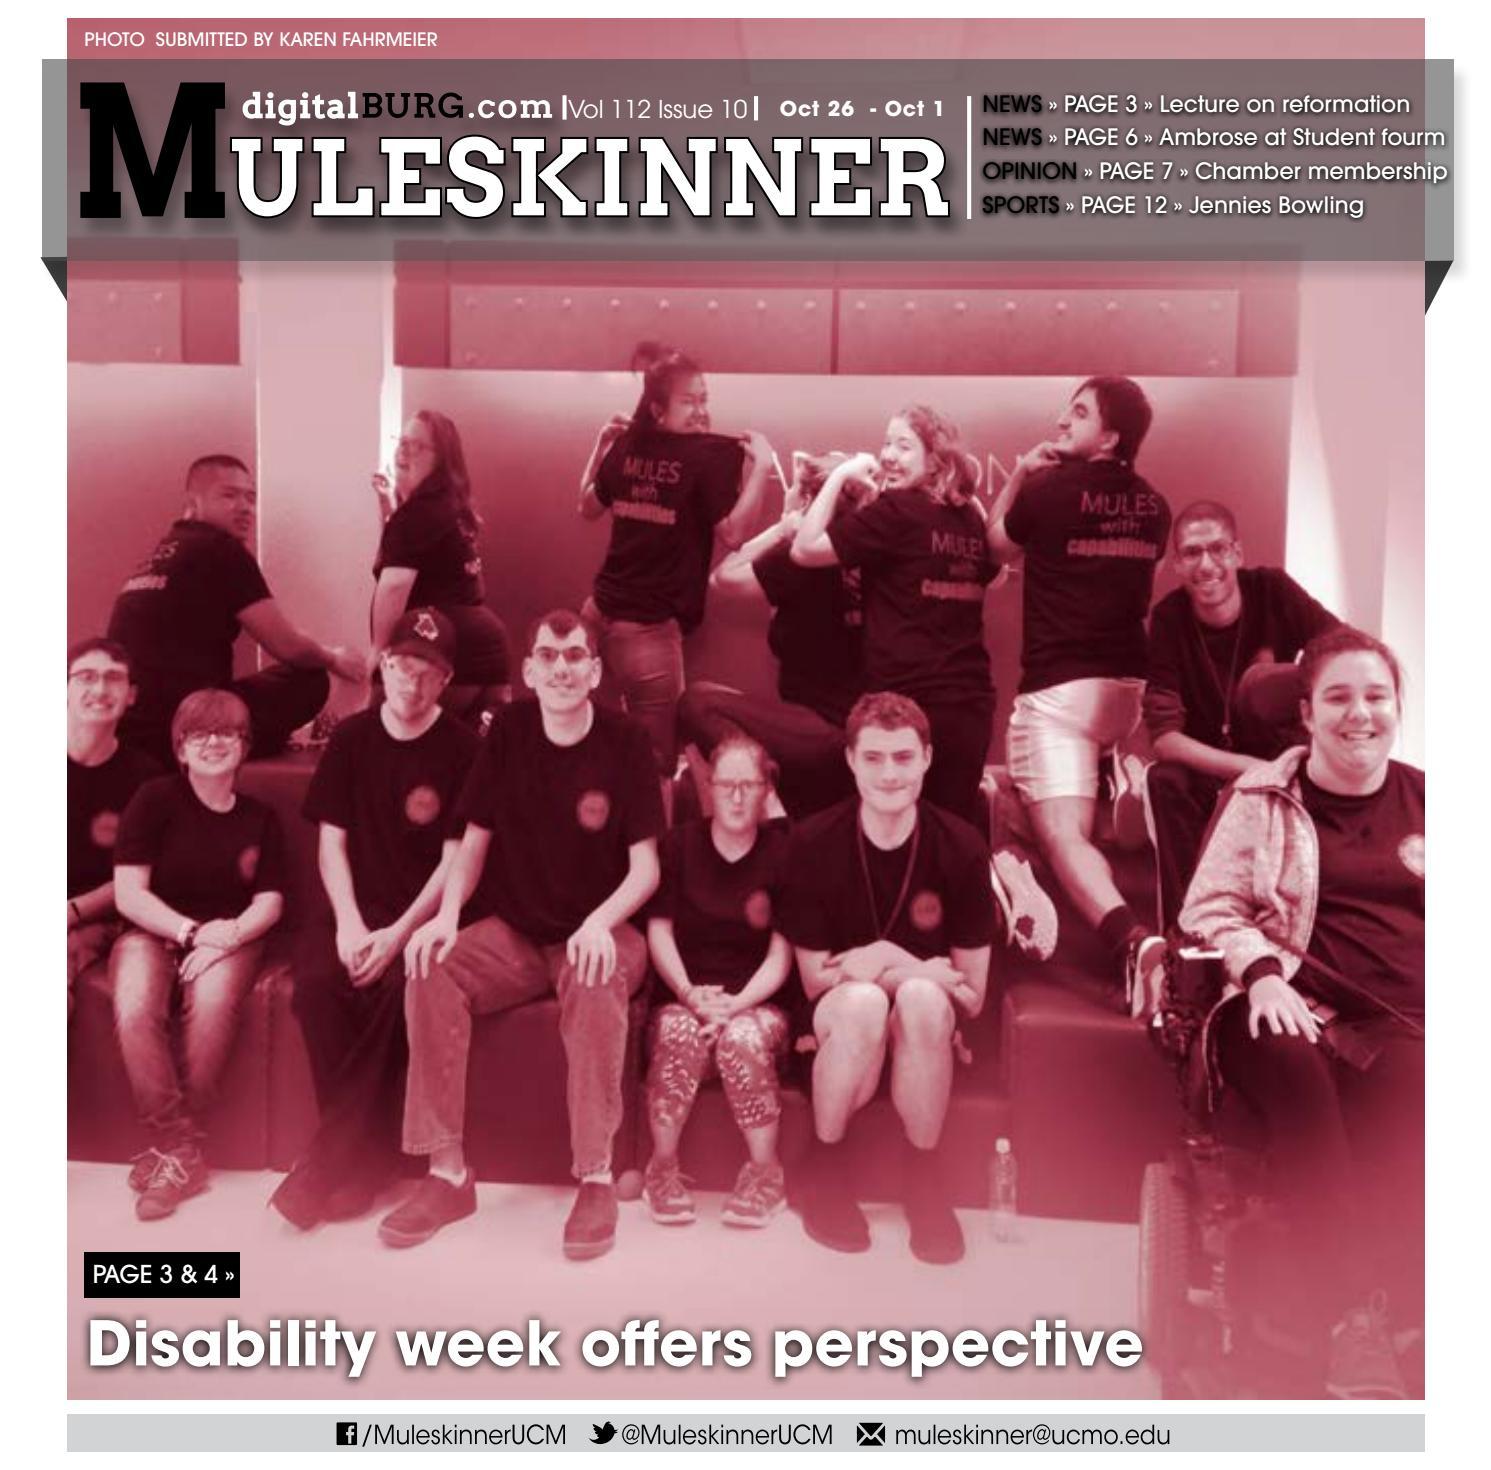 Muleskinner Vol. 112 Issue 10 10.26.17 by UCM Muleskinner